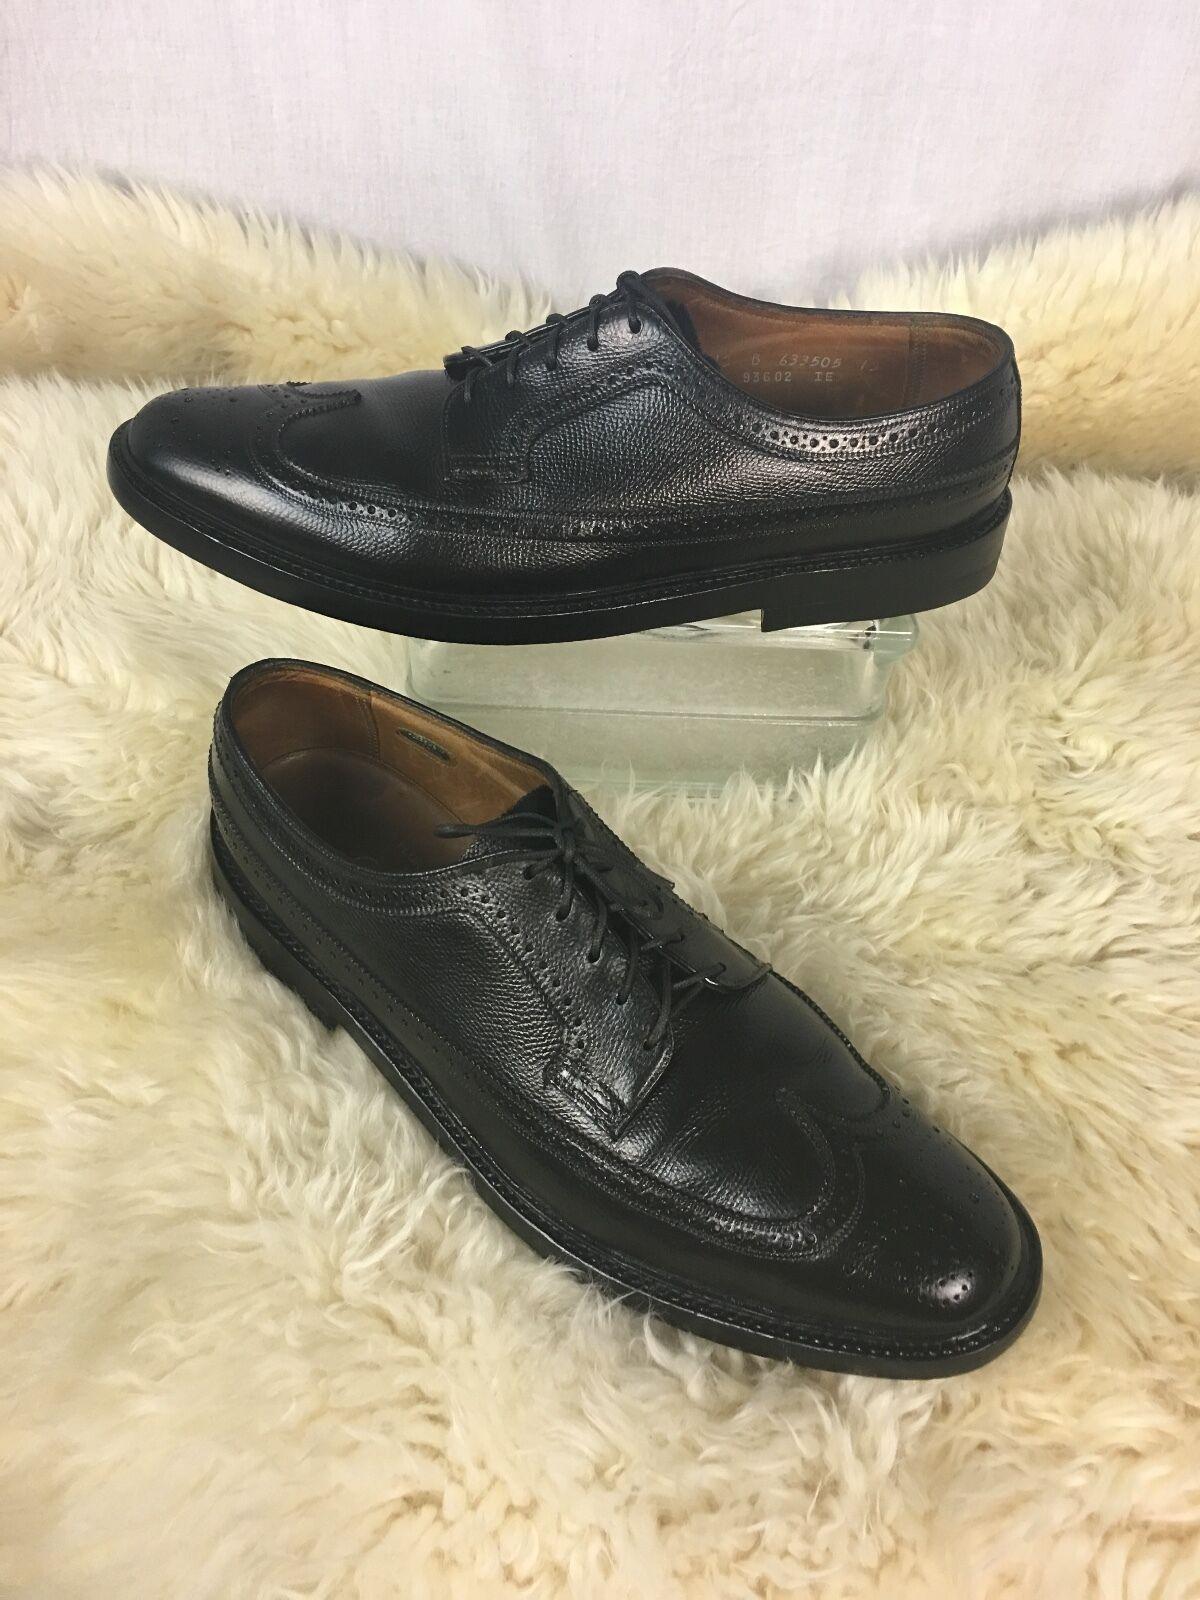 Florsheim ROYAL IMPERIAL  5 Nail V-Cale  Bout D'Aile Chaussures Oxford Noir 12B